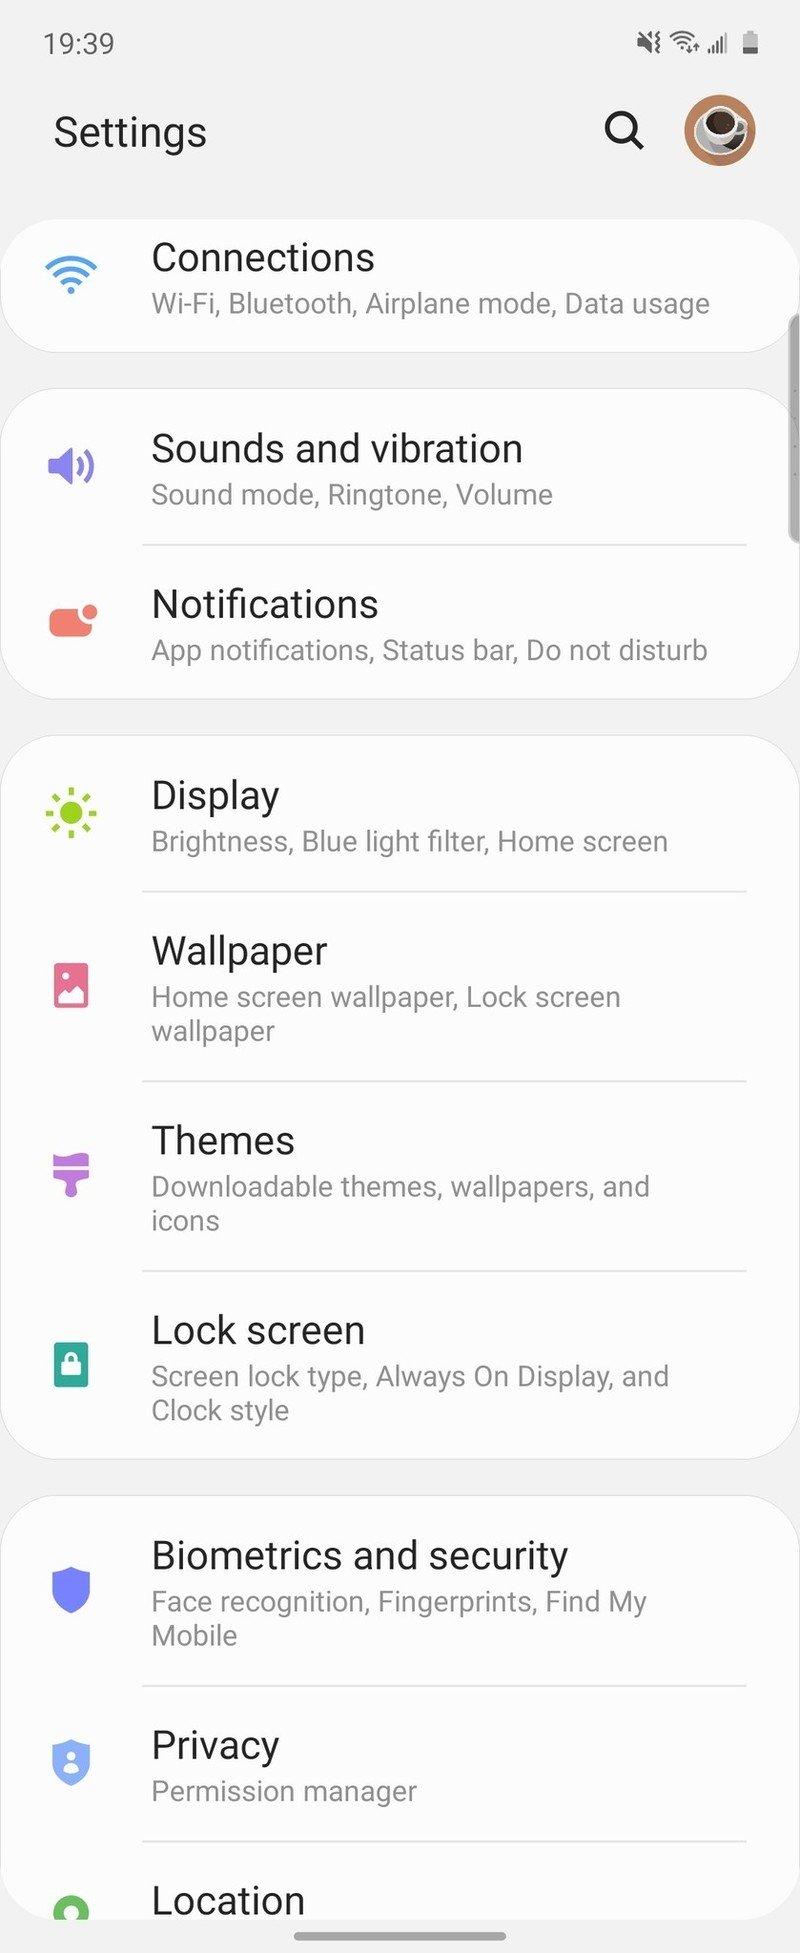 screenshot_20200214-193938_settings.jpg?